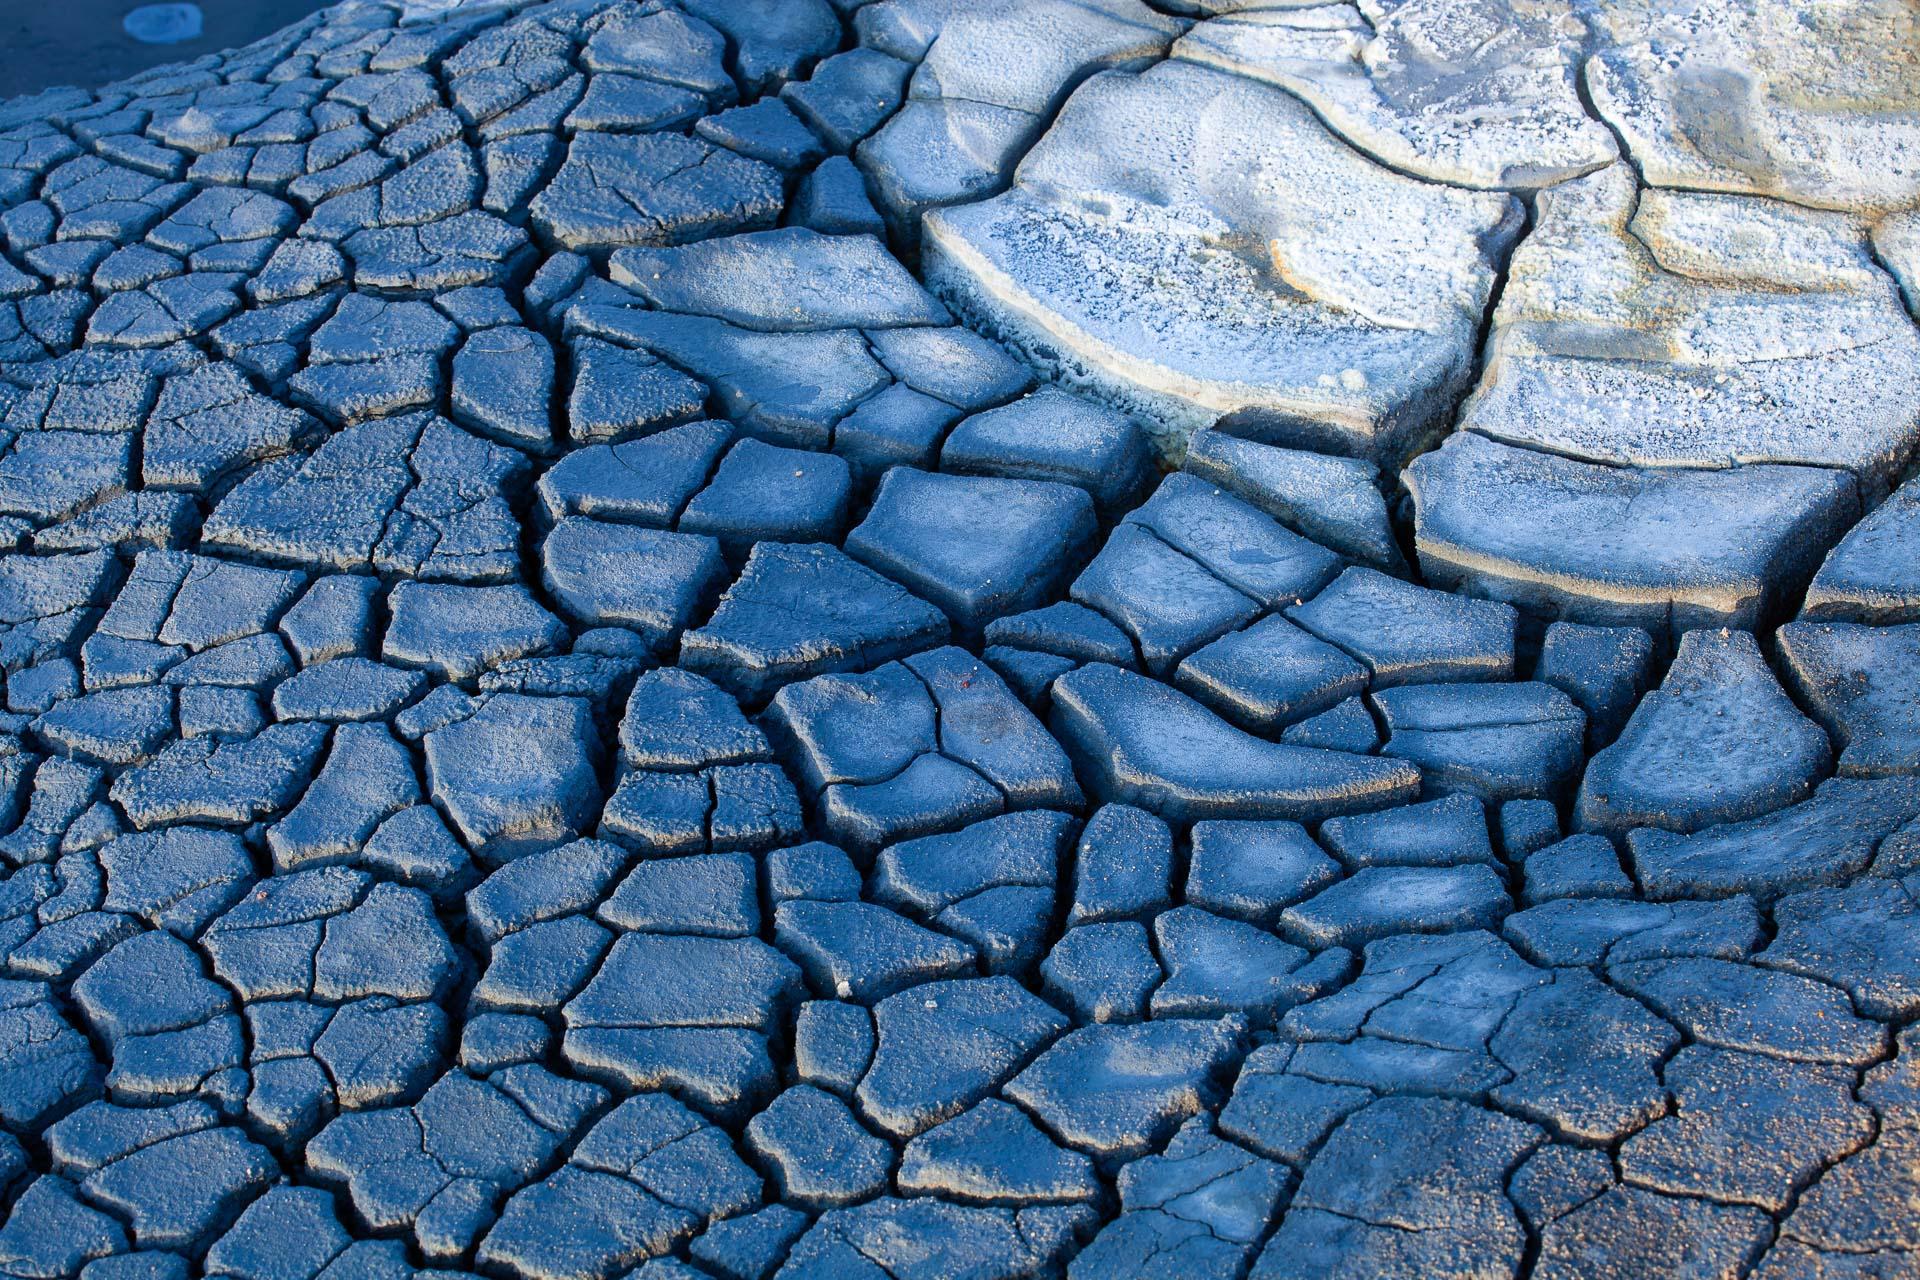 motifs dans la boue de Hverarönd en Islande